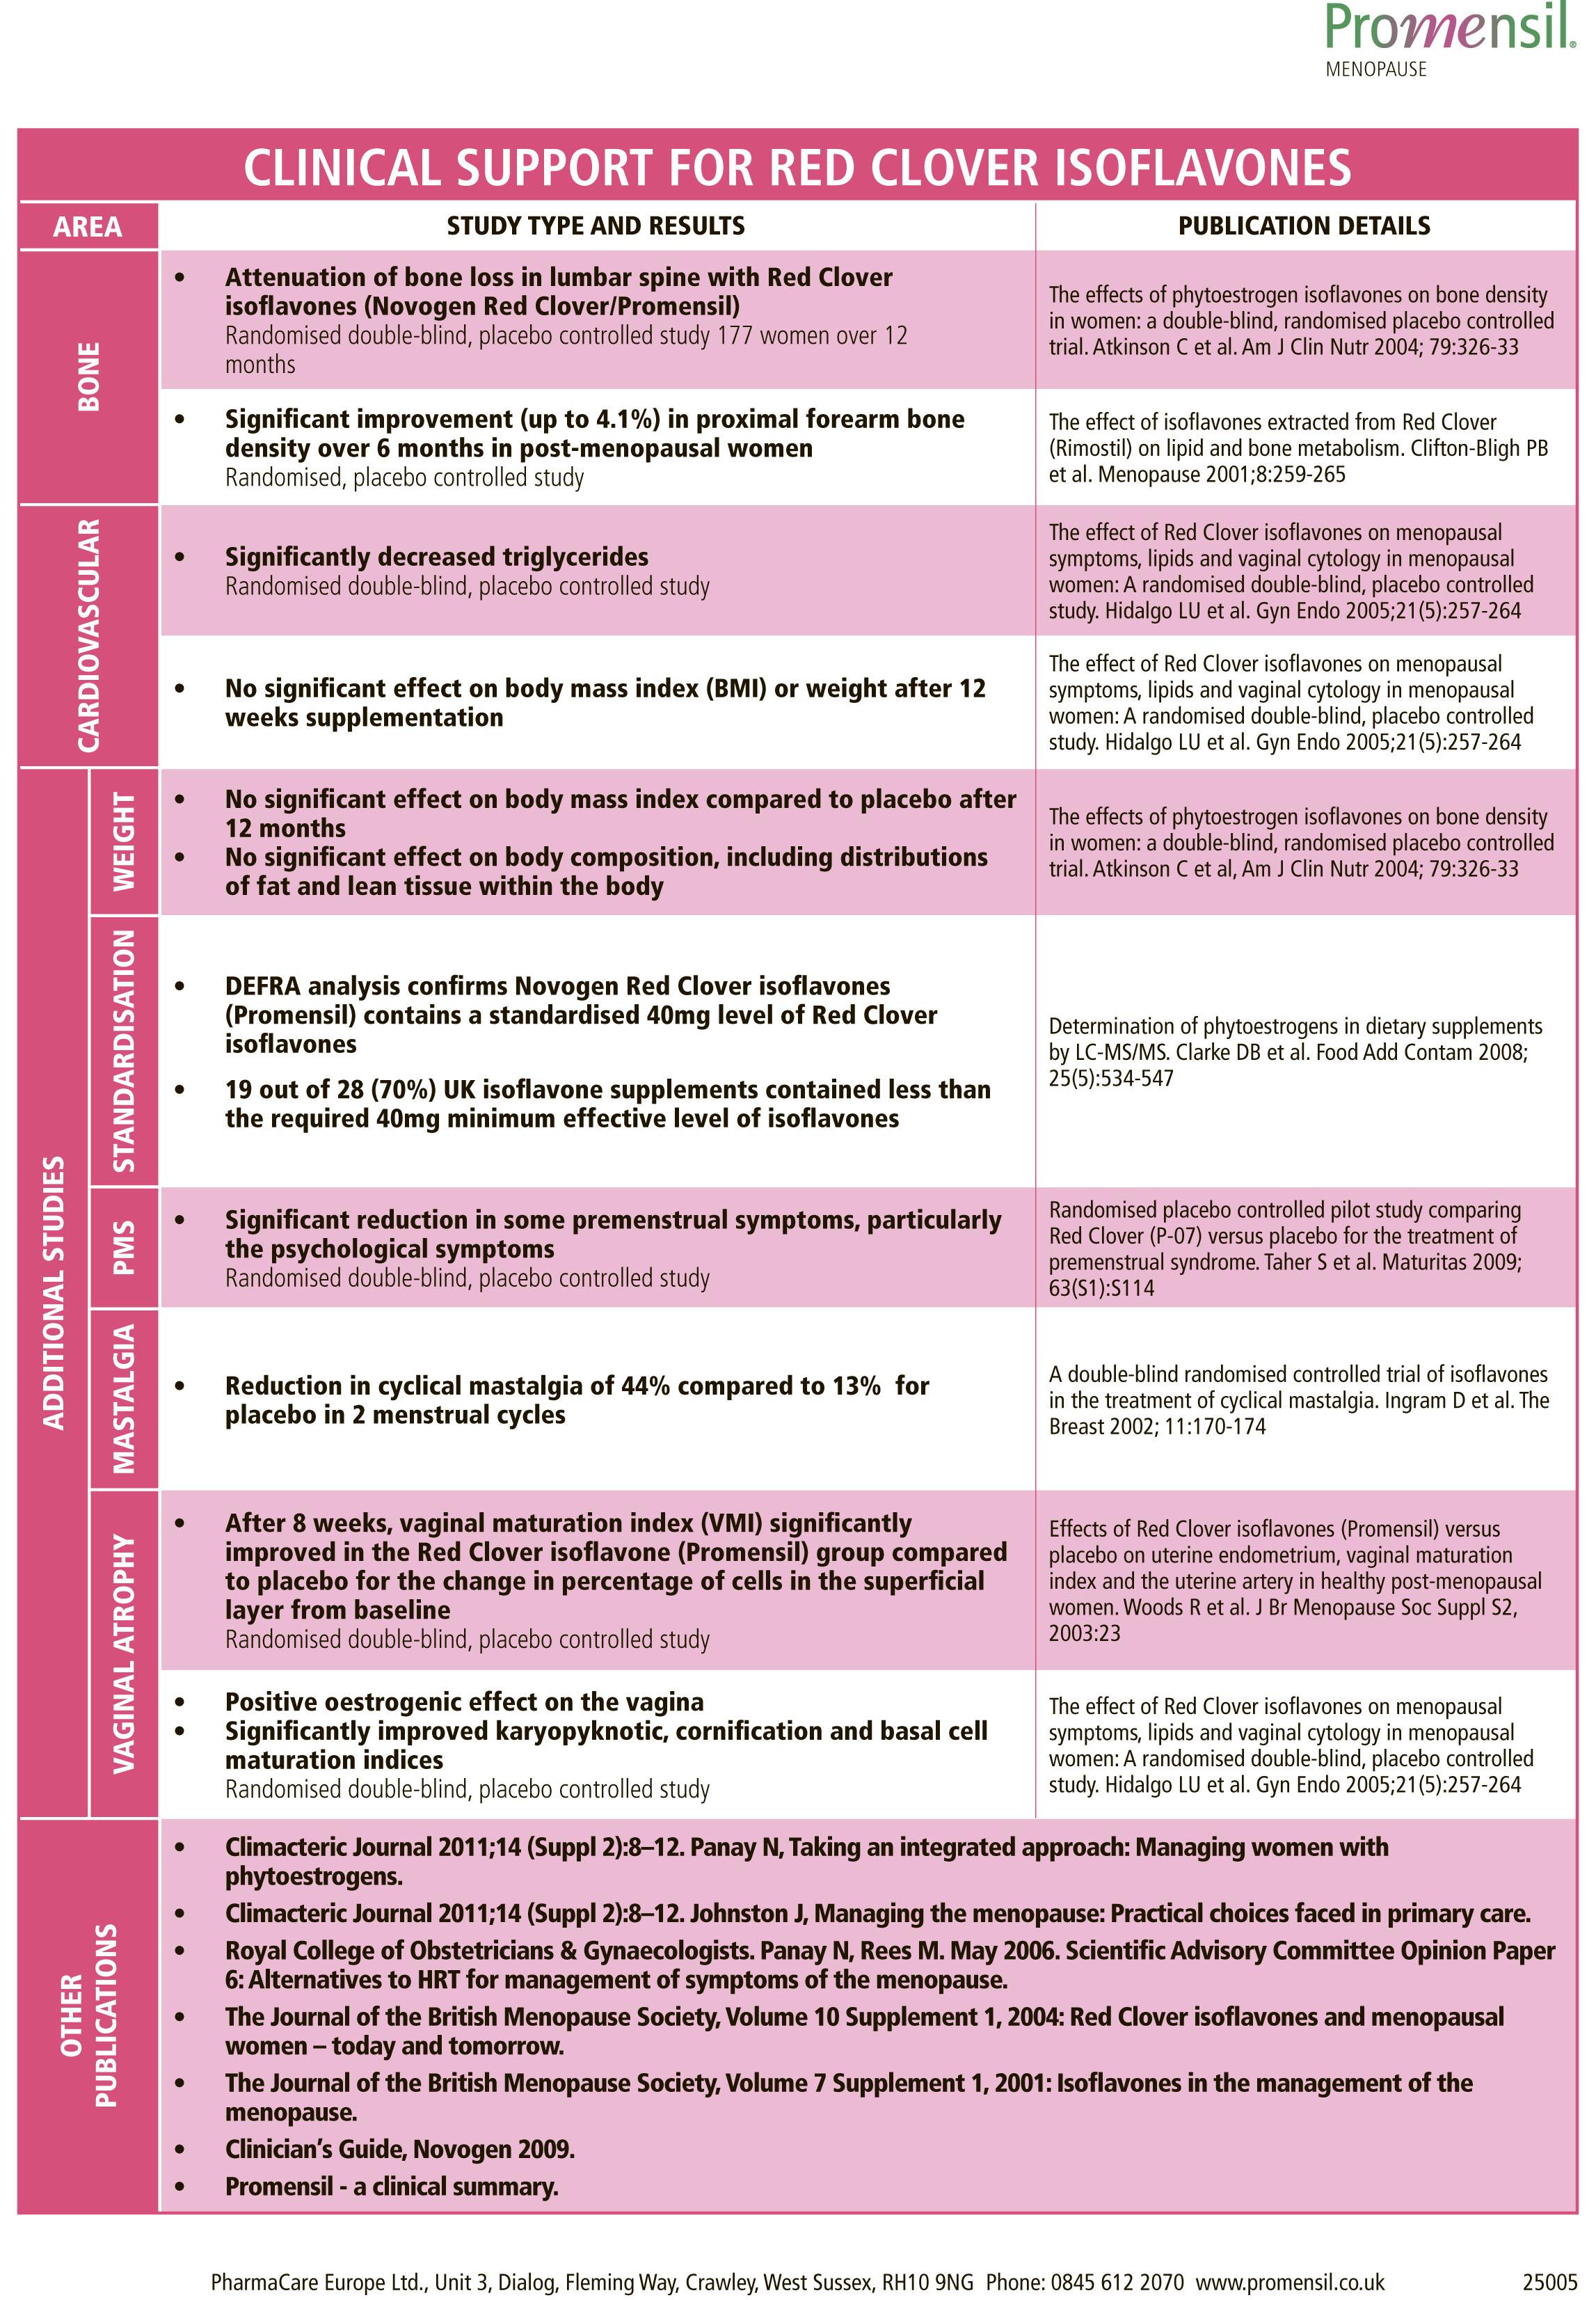 Promensil Clinical Summary-2